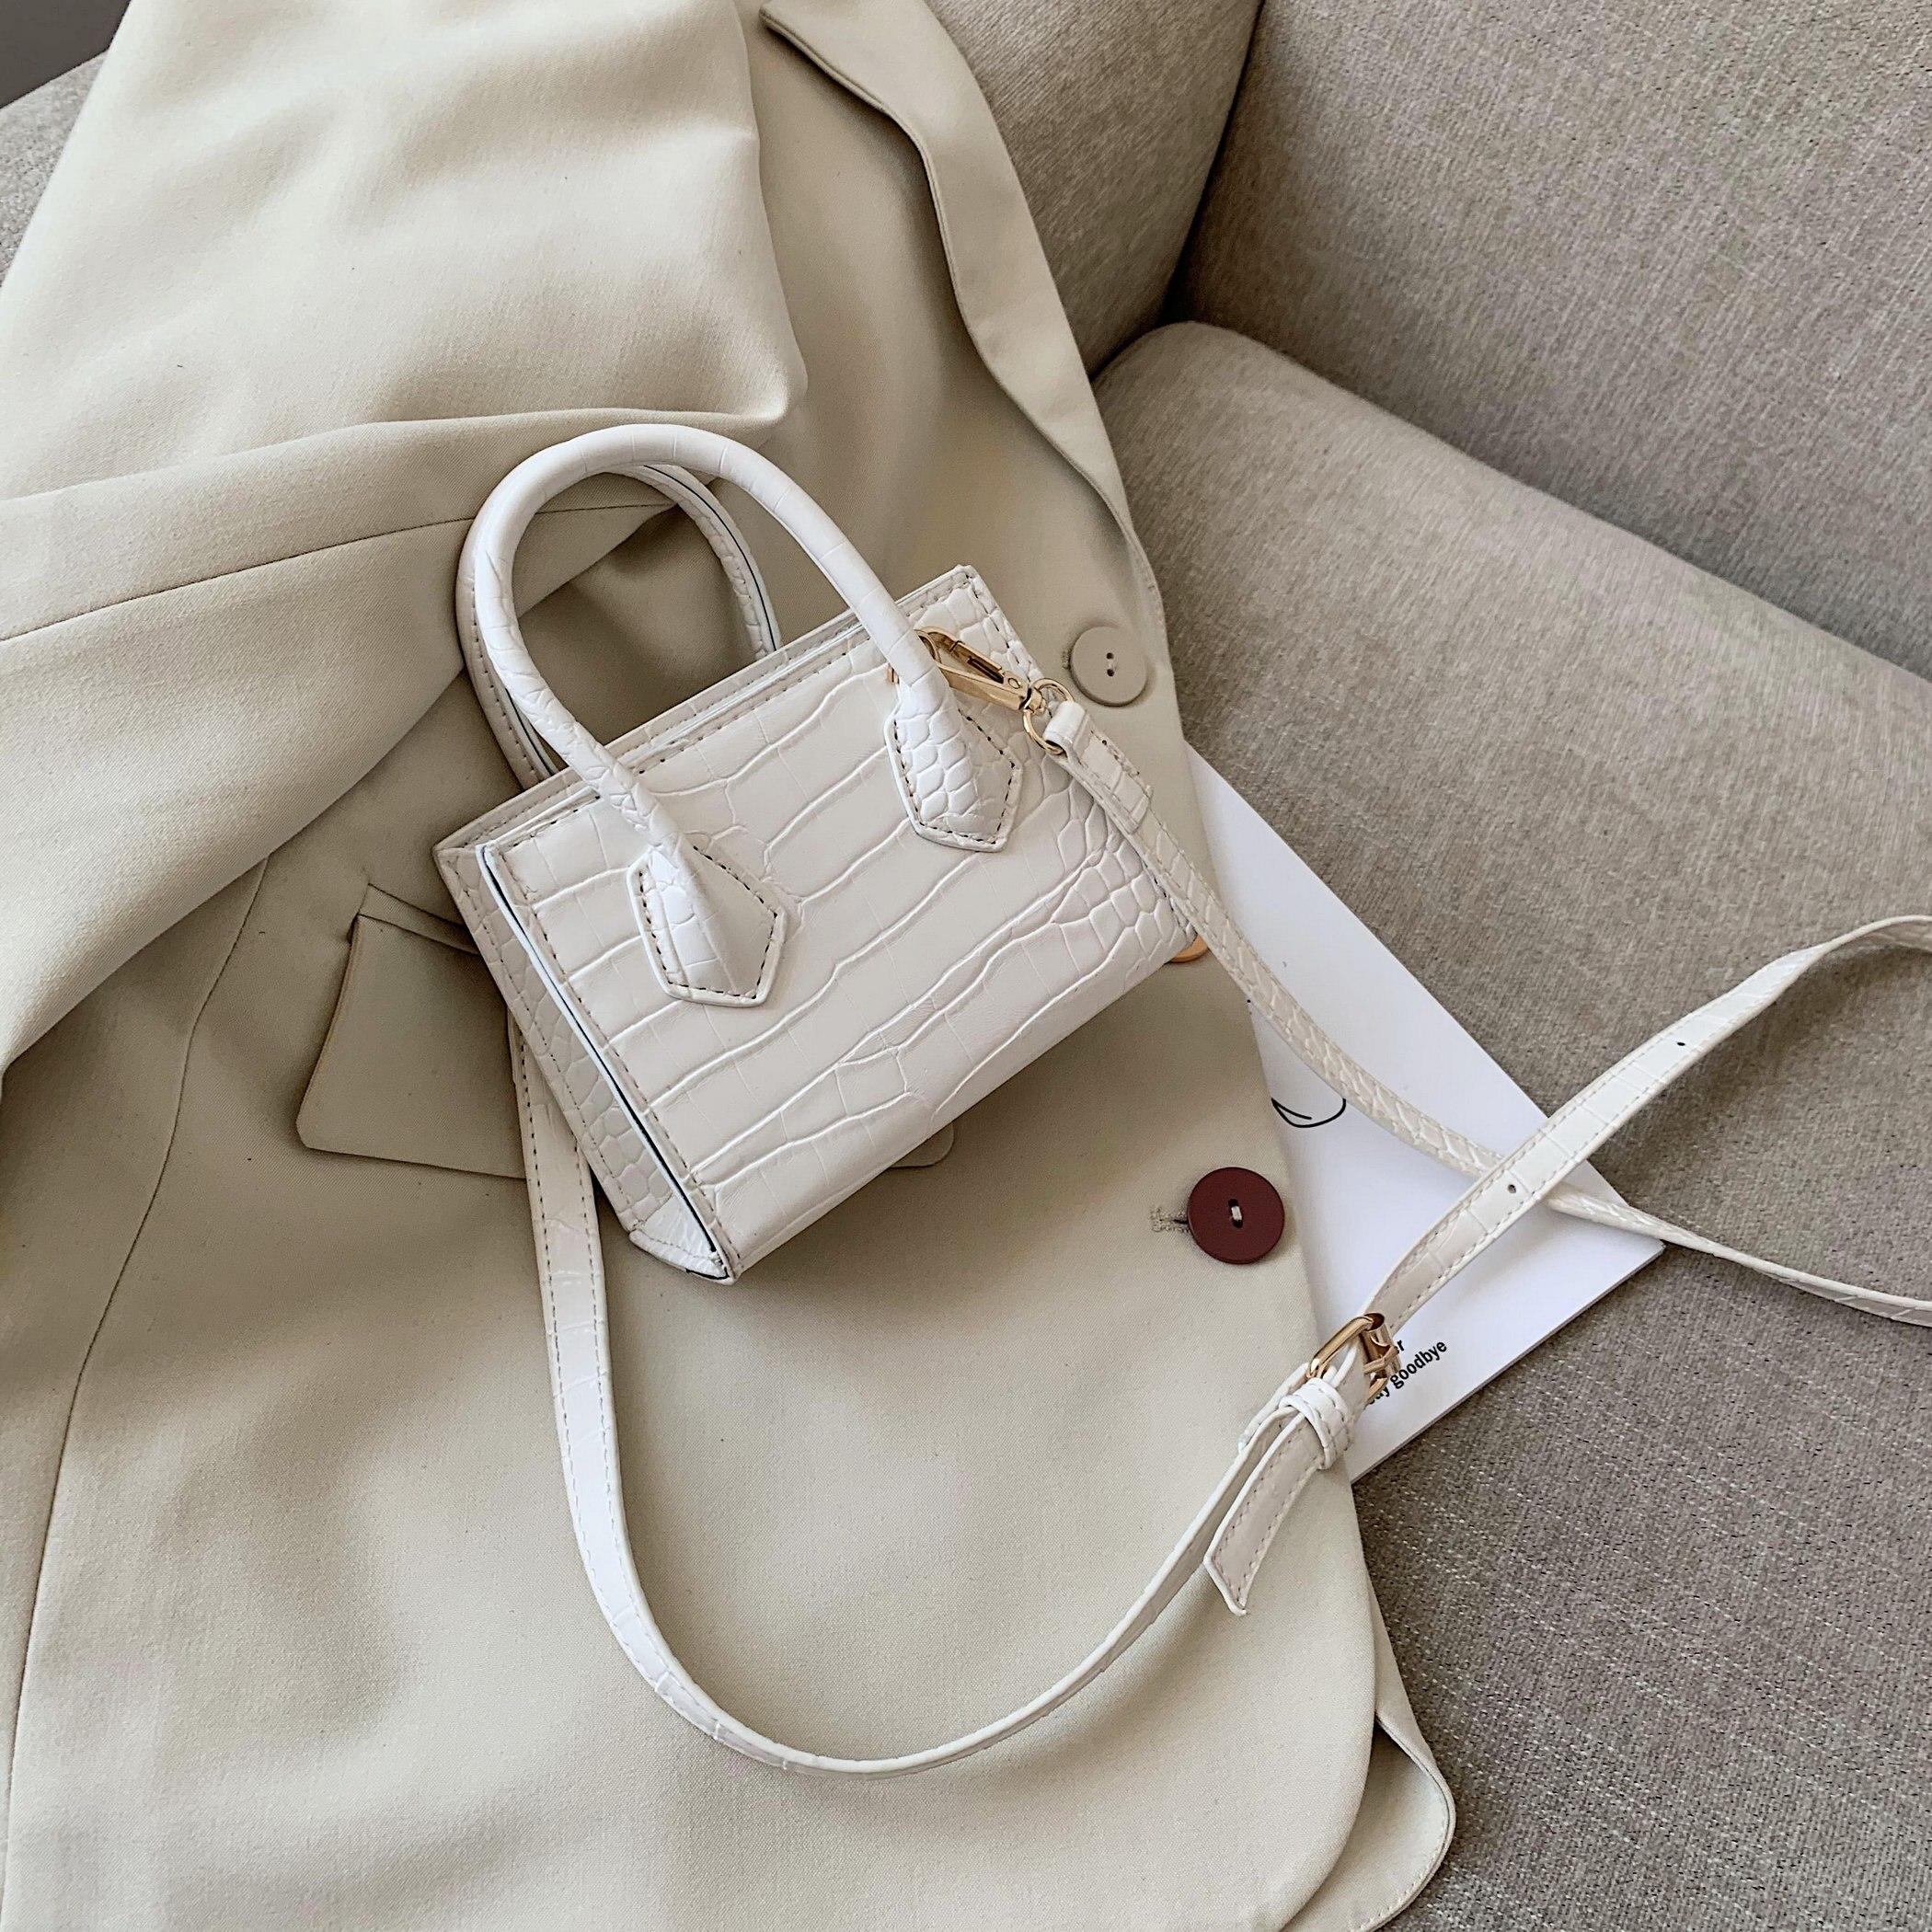 Super Mini PU Leather Crossbody Bags For Women 2020 Crocodile Pattern Shoulder Handbags Female Travel Lipstick Totes